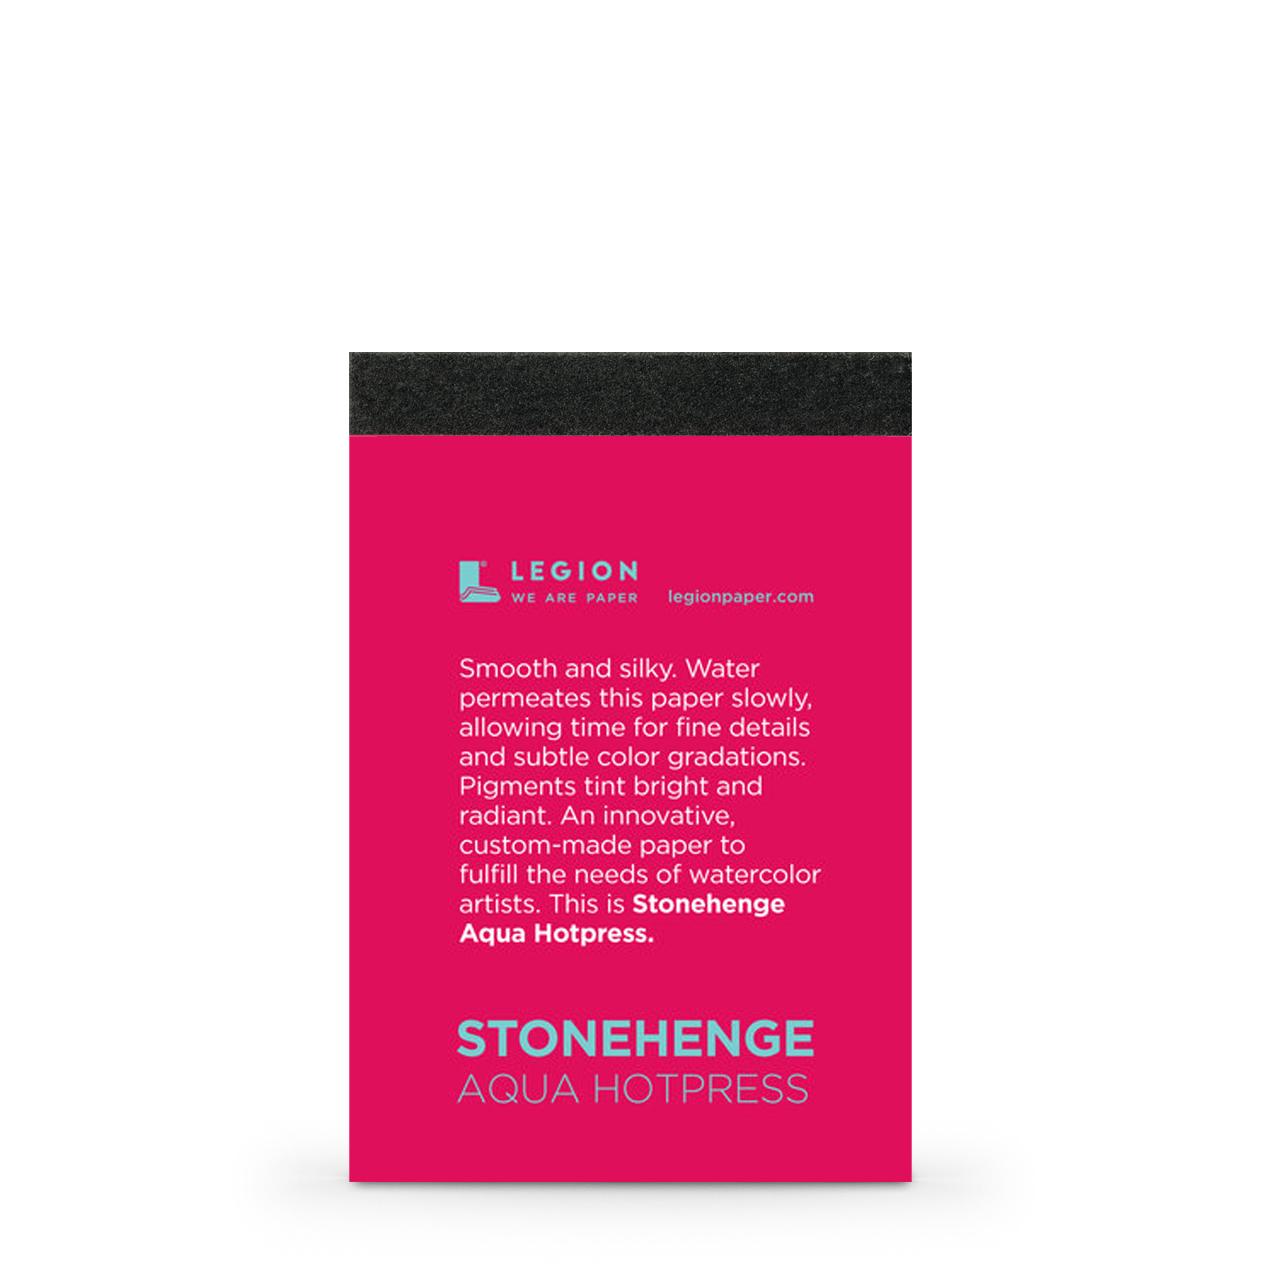 Stonehenge Aqua Hotpress Sample